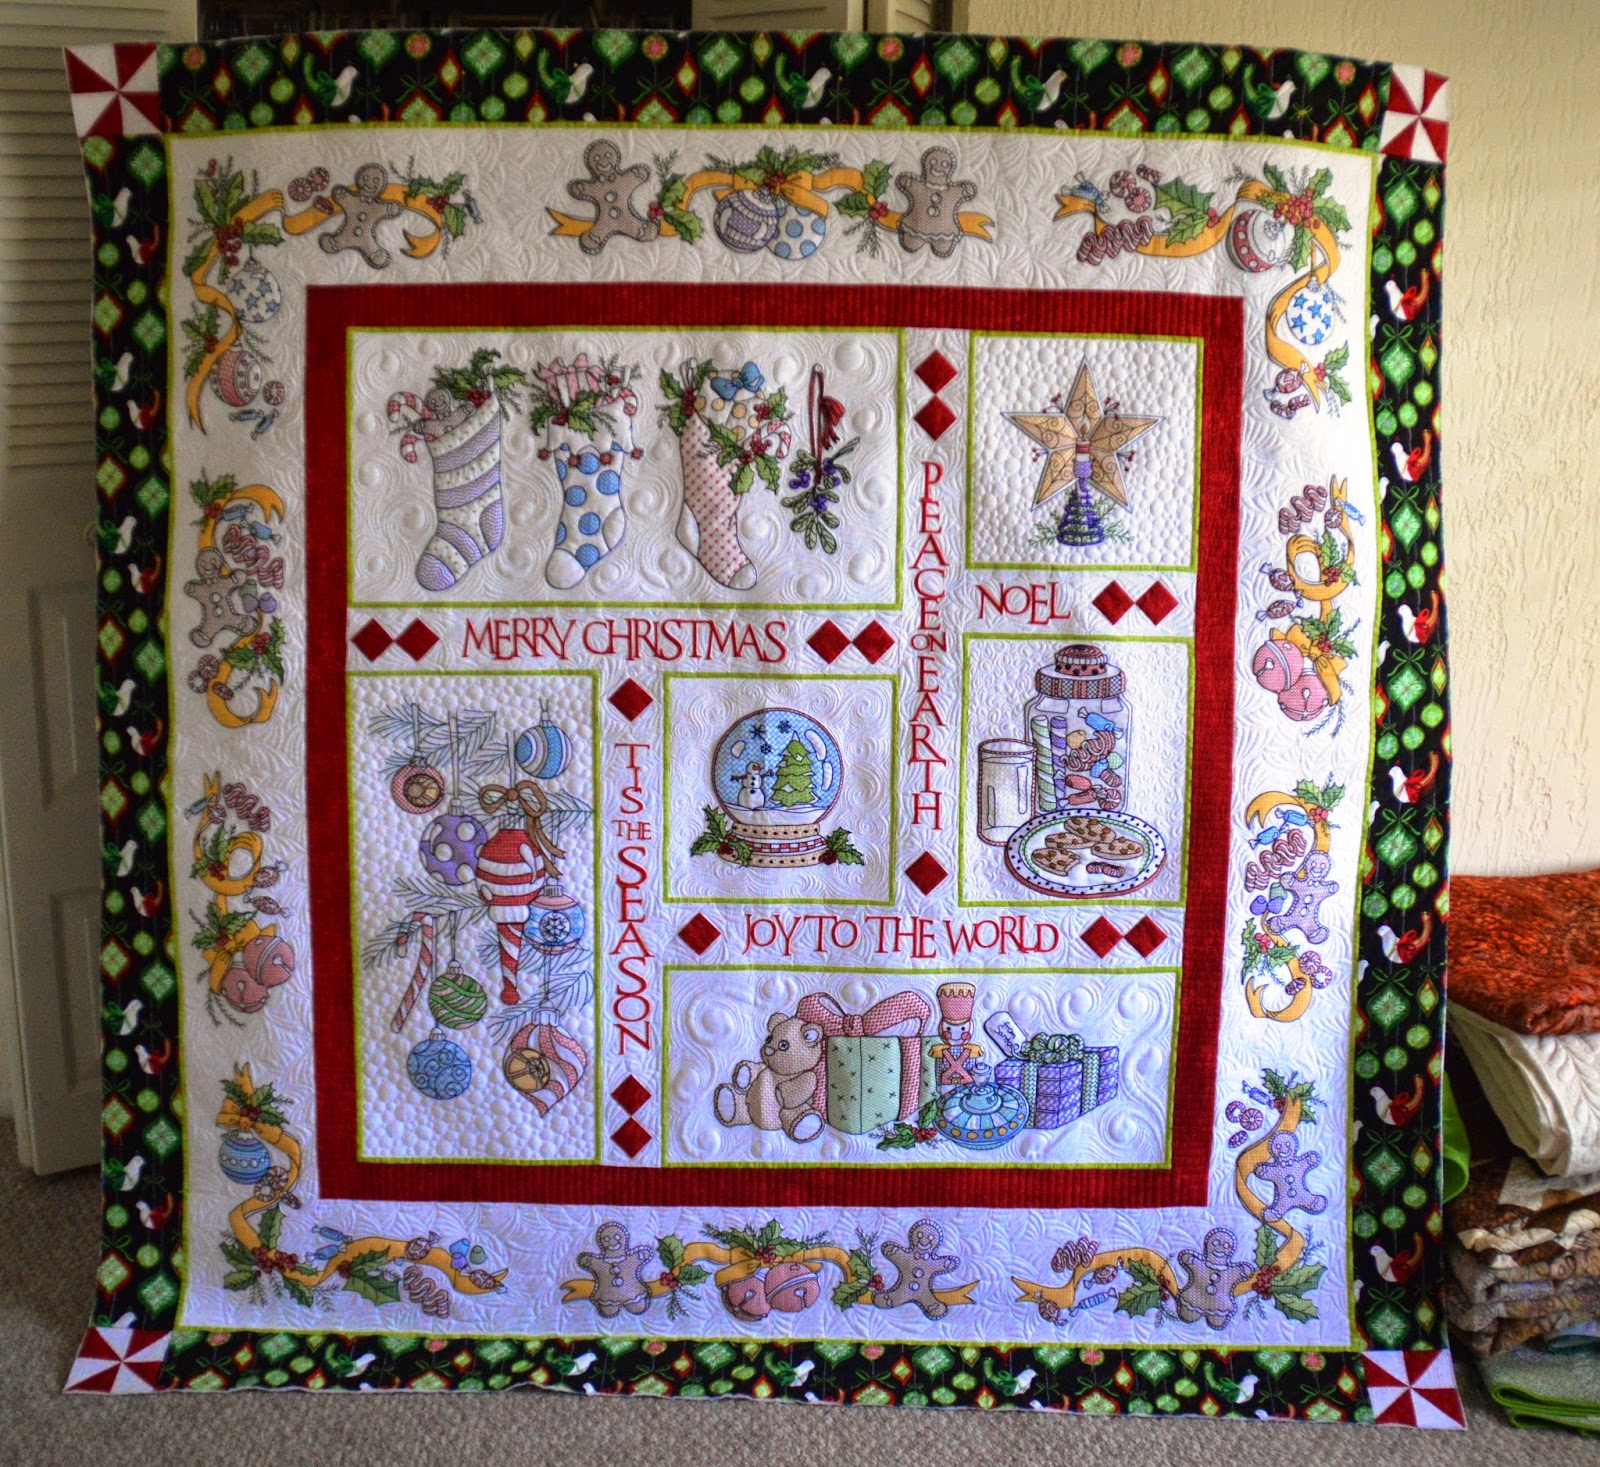 Creative Longarm Quilting by Karen Marchetti: Mel's Tis the Season ... : karen quilt - Adamdwight.com